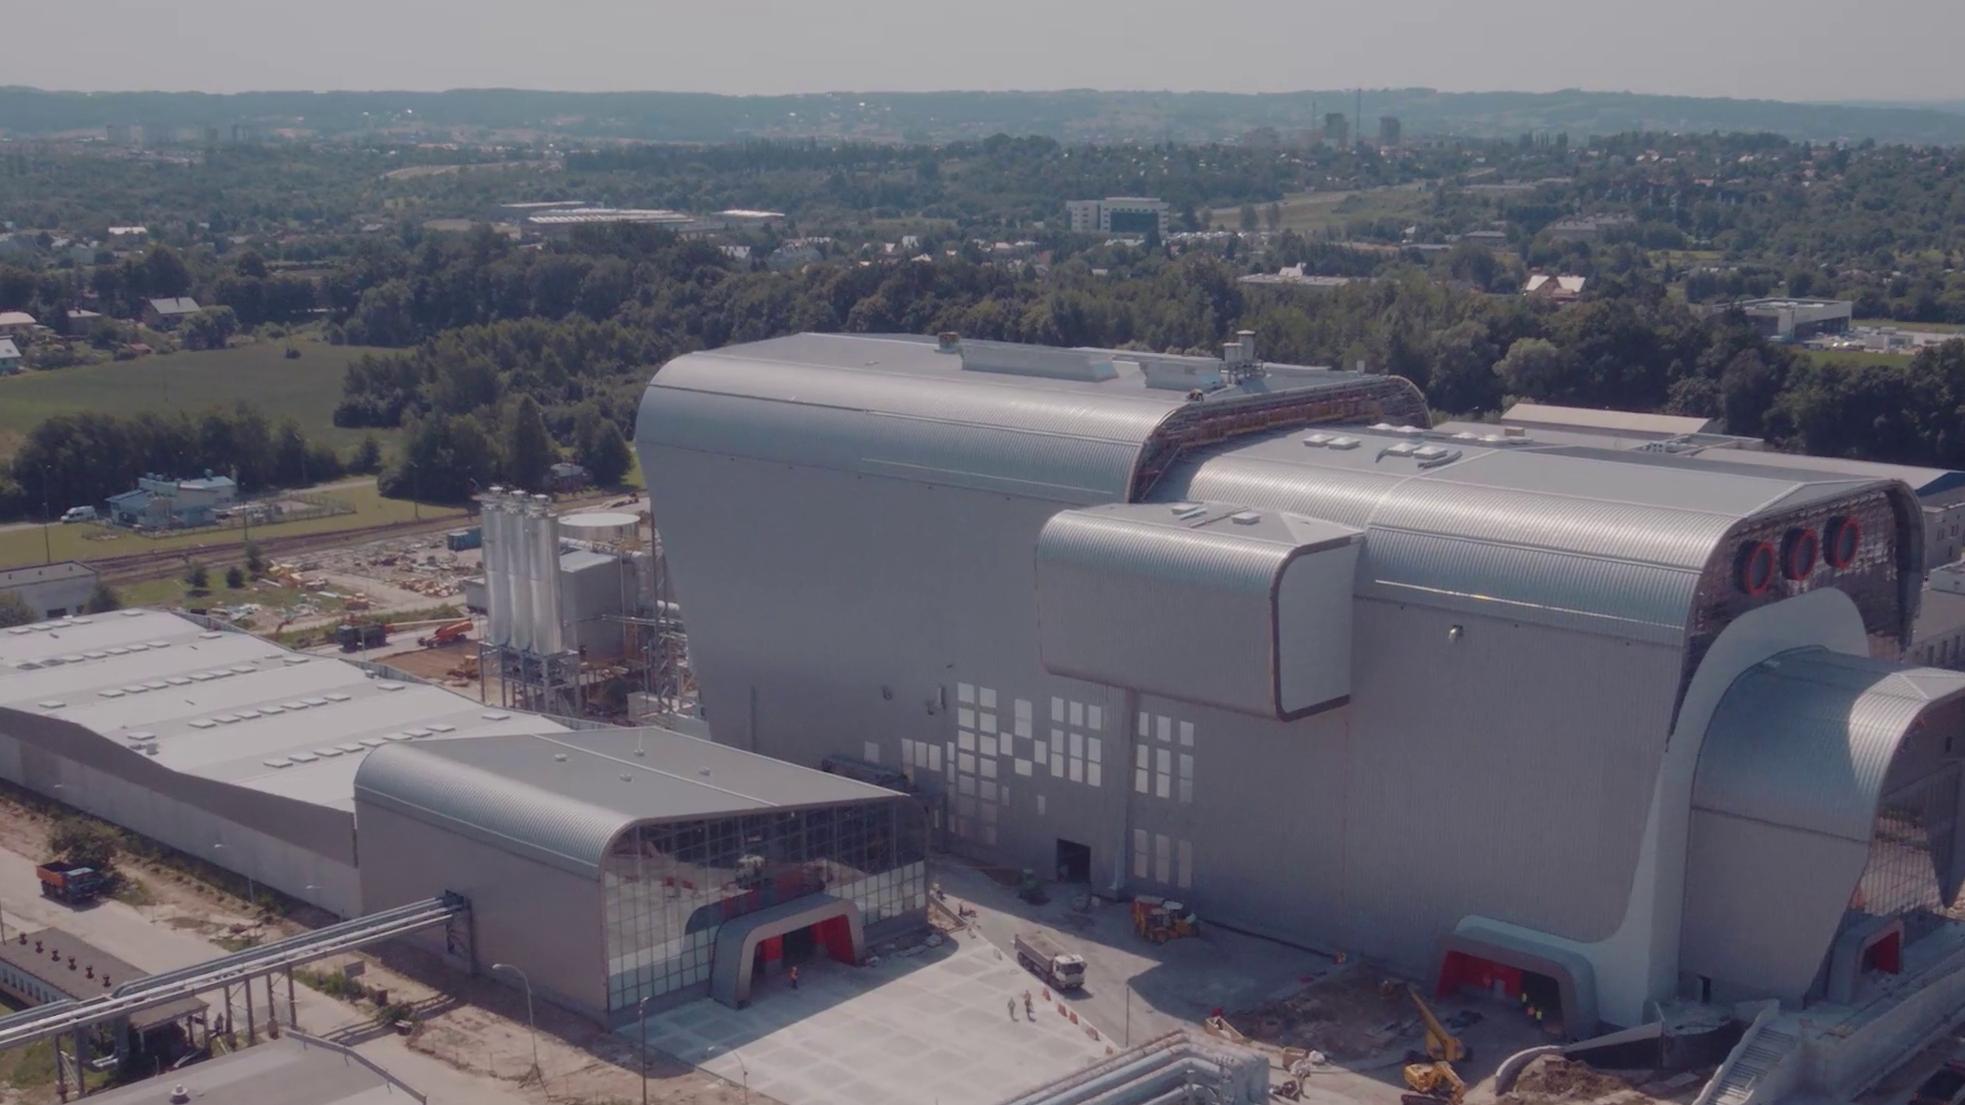 Gallery image 2 - WASTE TO ENERGY PLANT -  RZESZÒW  - POLAND